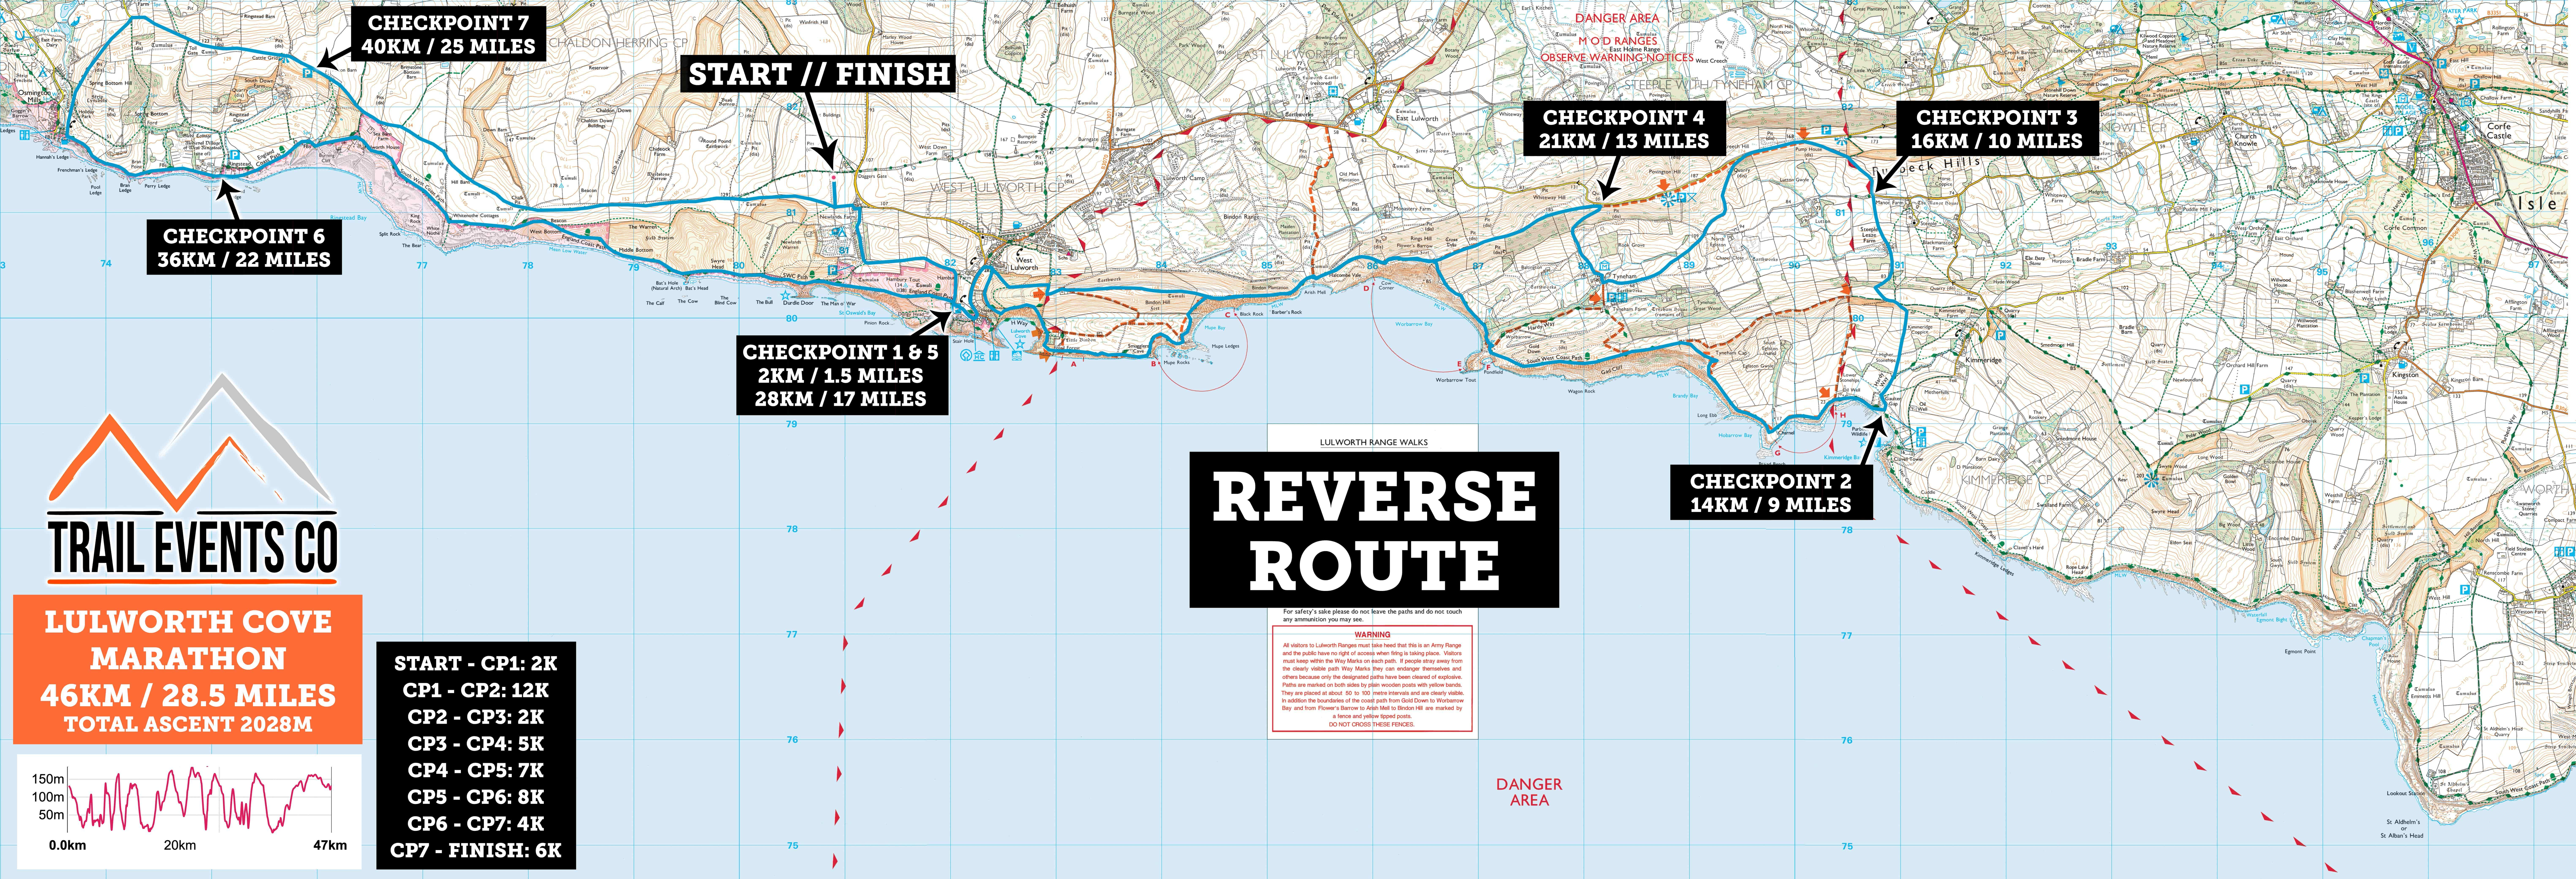 Lulworth Cove Marathon Reverse